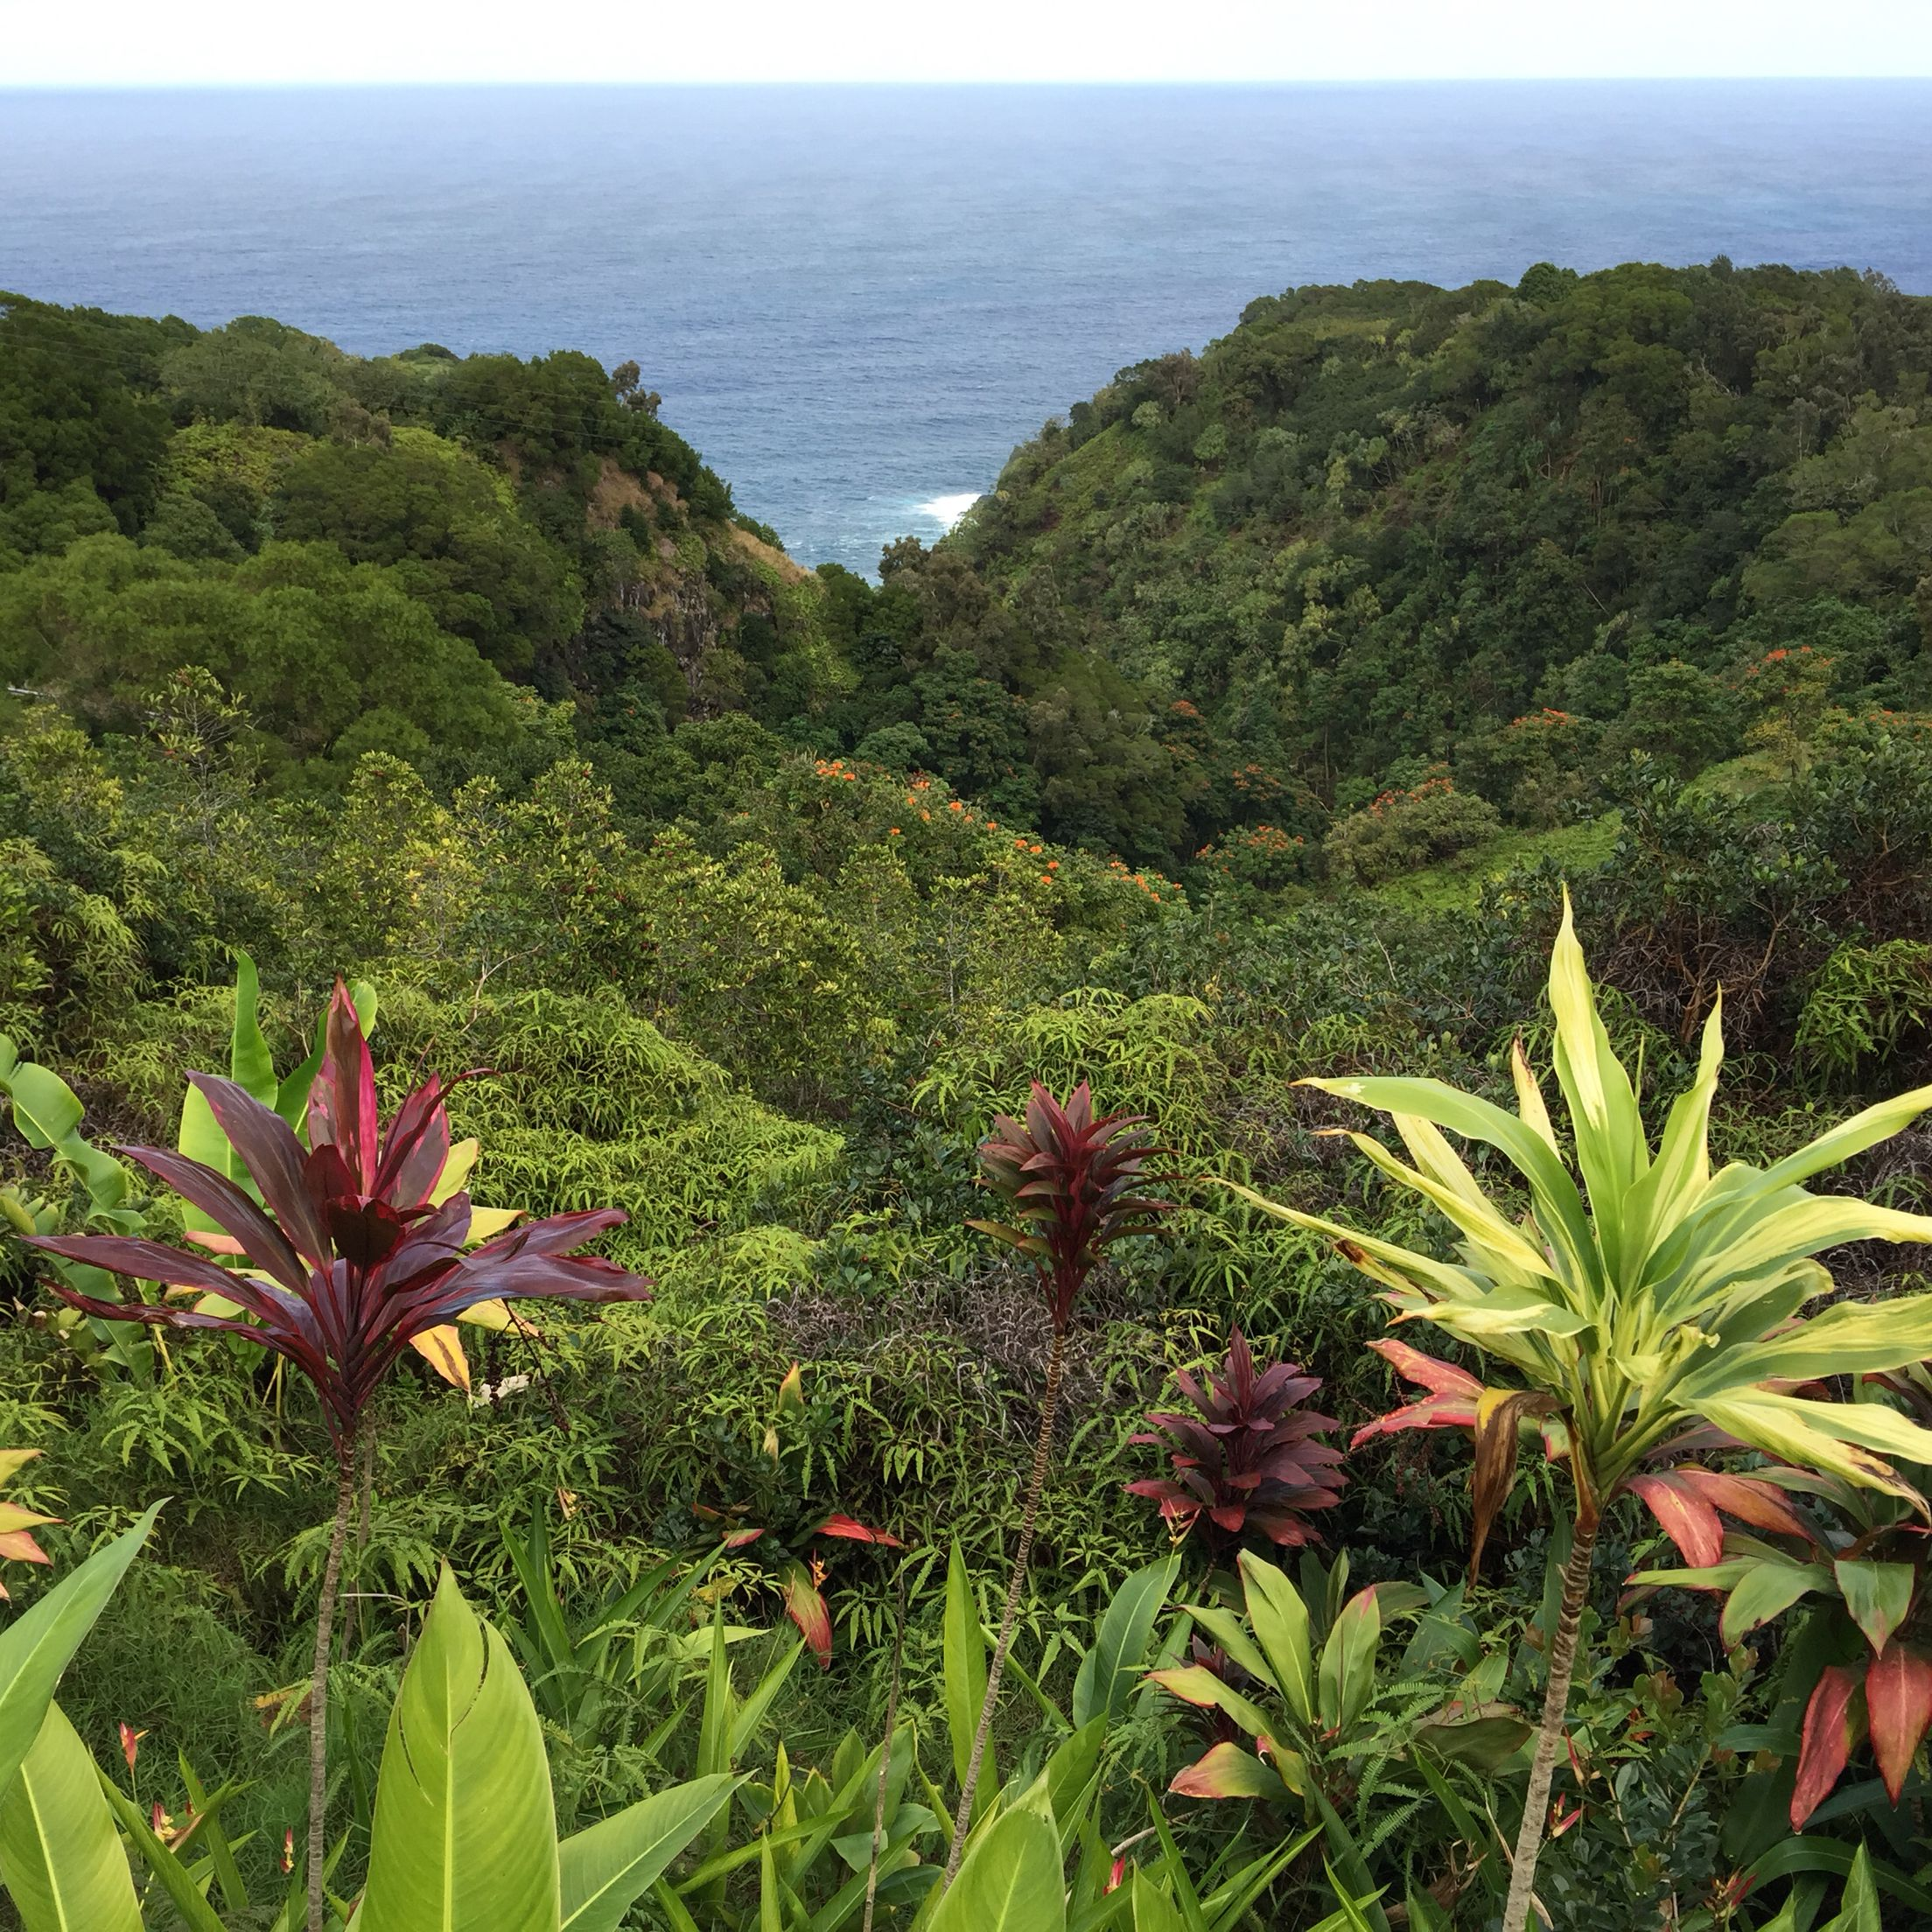 acaf3f8948ab421ebf8d3f3e9752d394 - Hana Maui Botanical Gardens Hana Hi